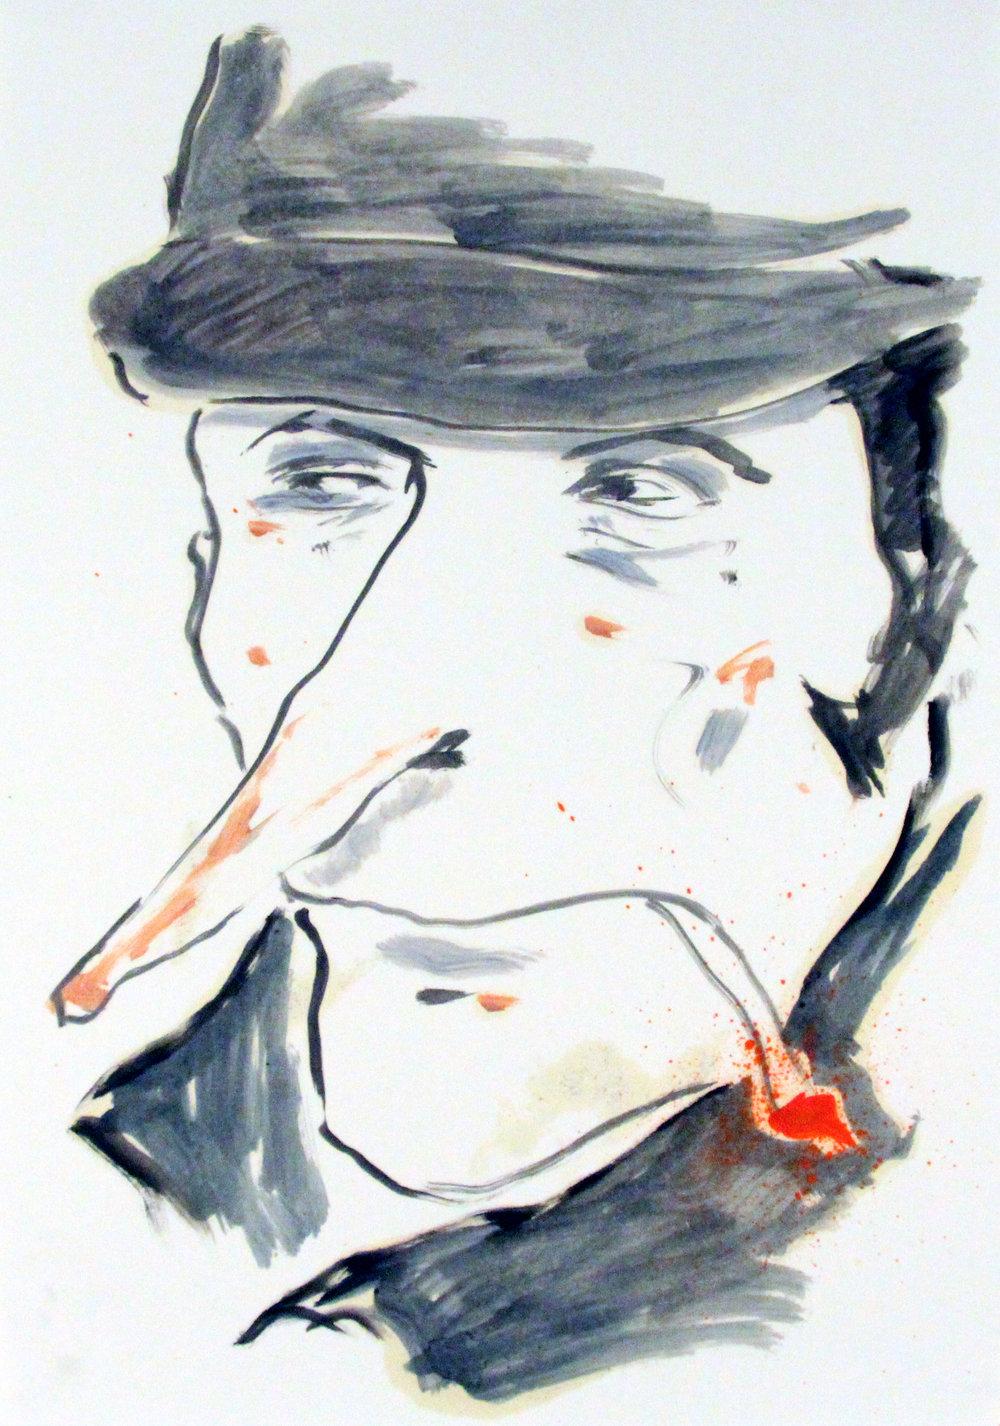 Portrait smoking_42x29cm_Oil on paper.jpg